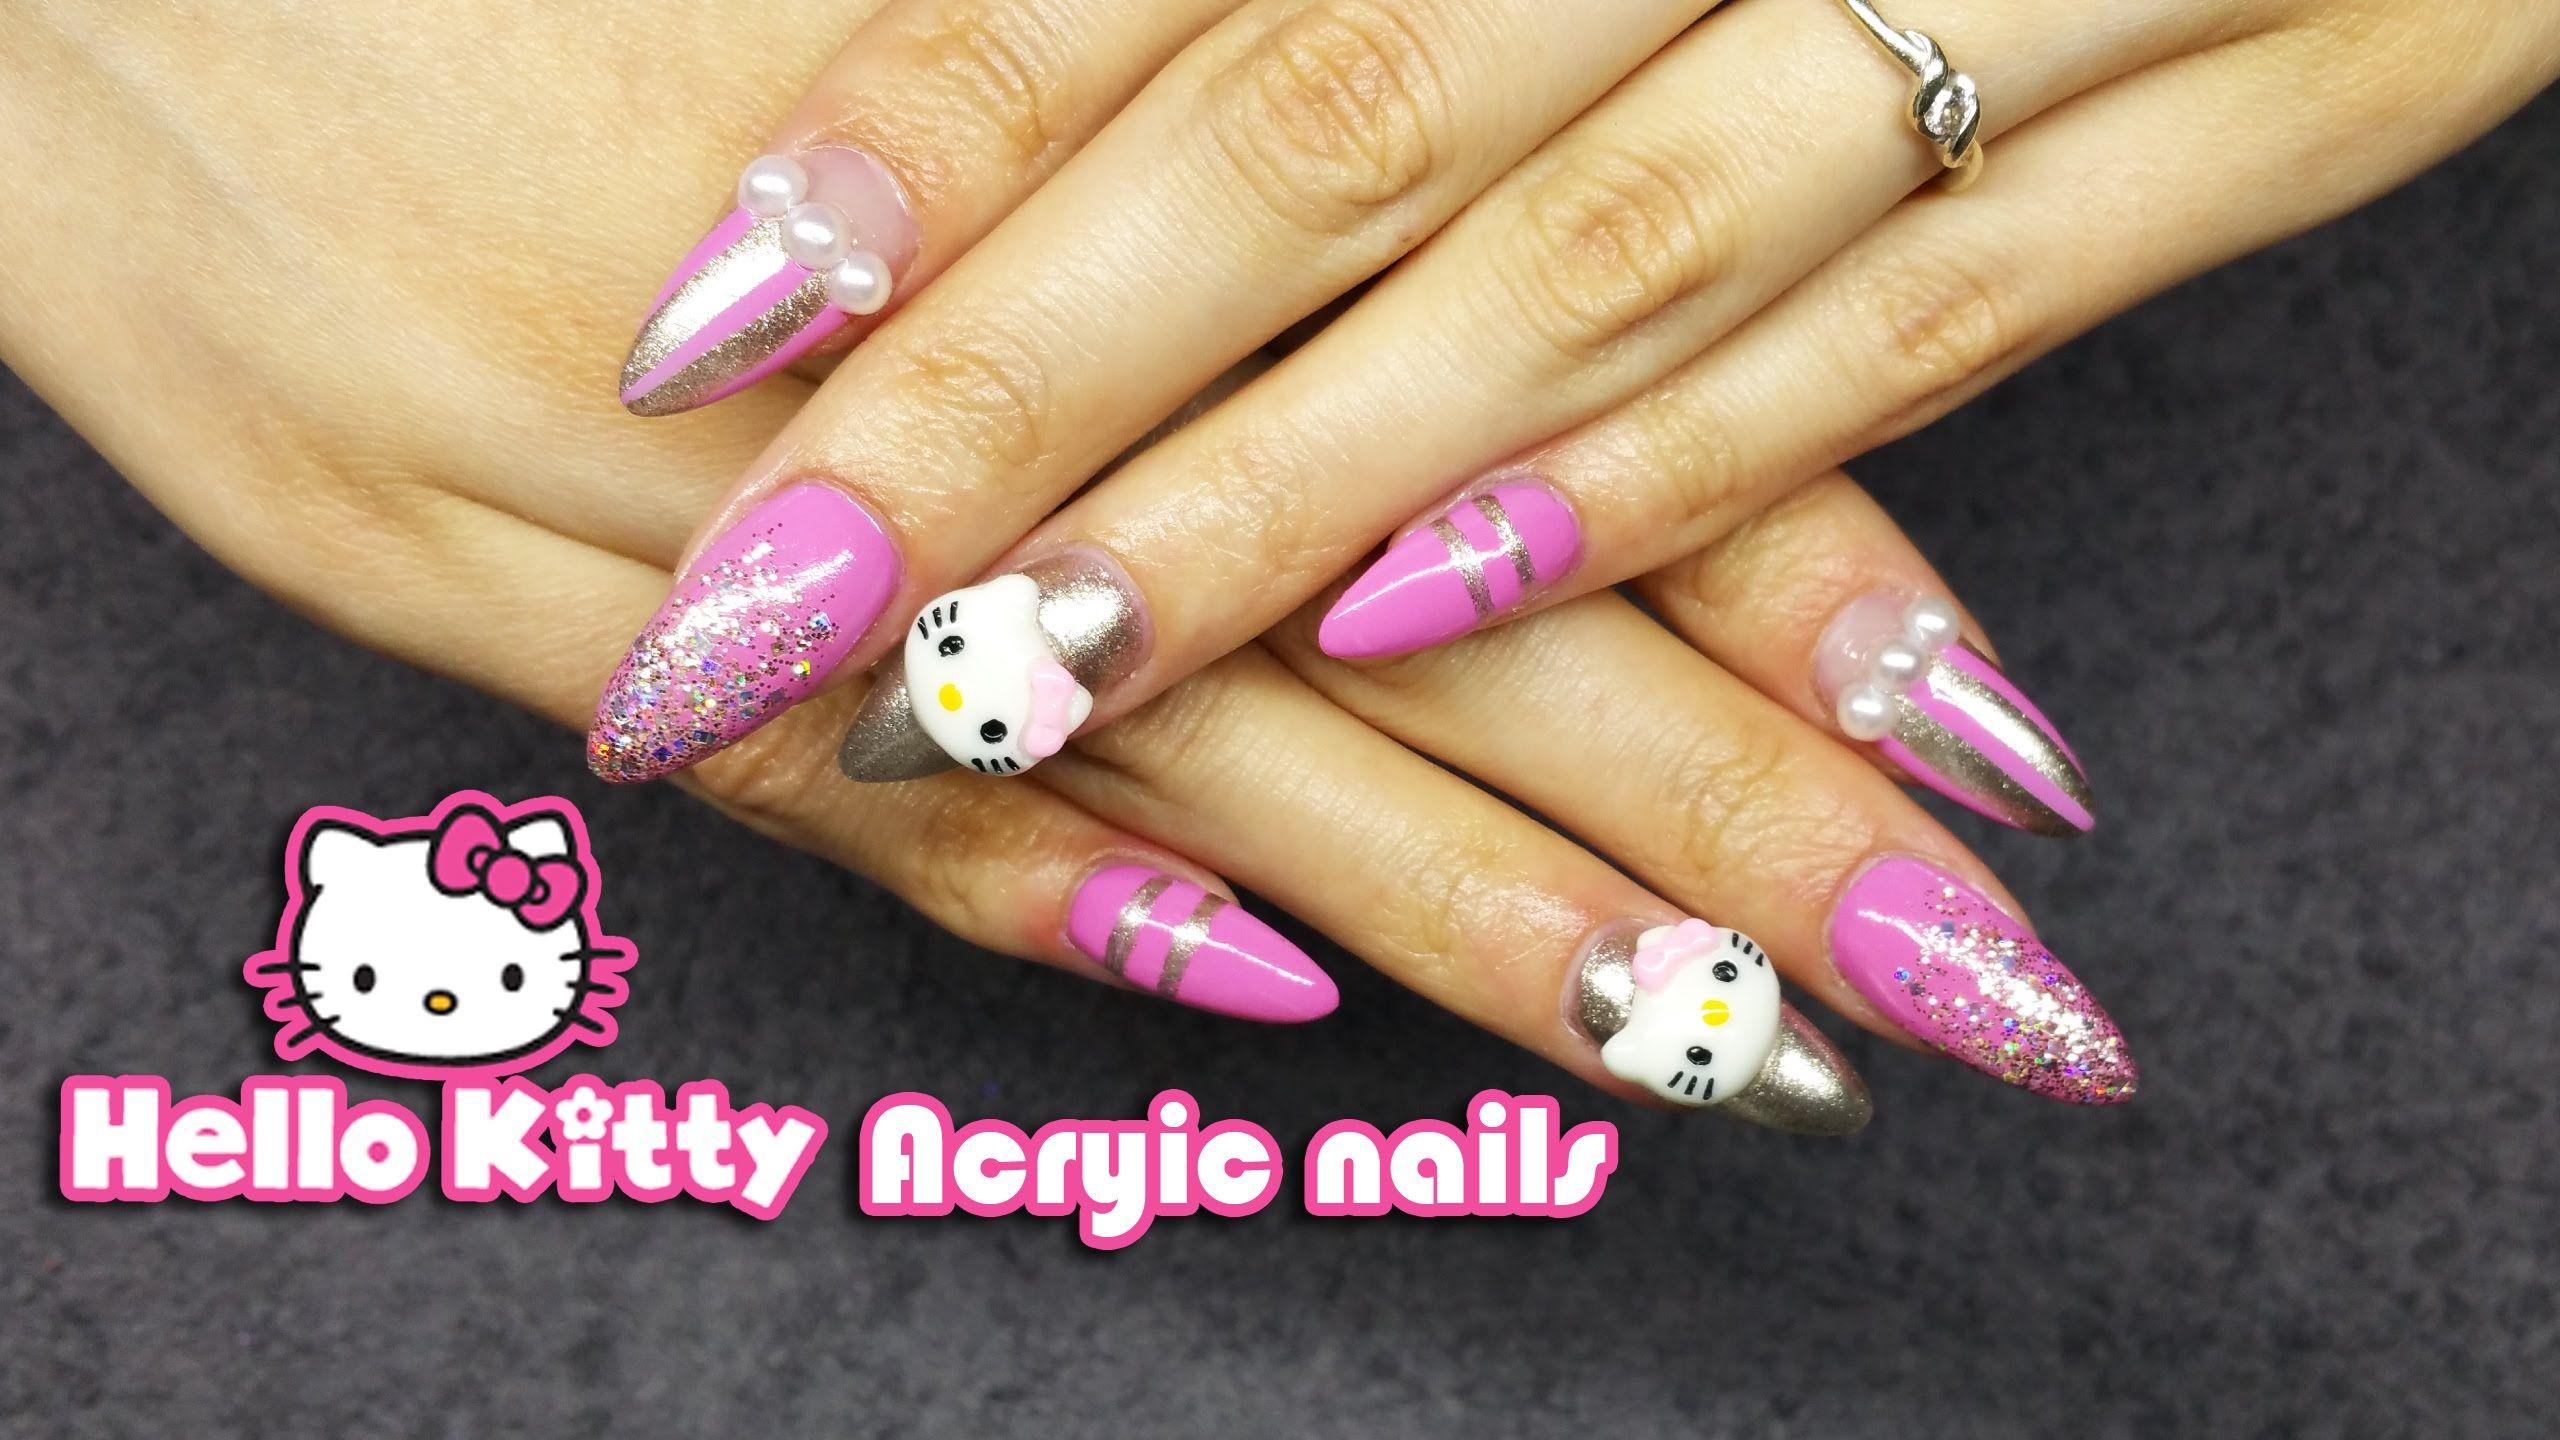 How To Hello Kitty Acrylic Nail Art Cute Design